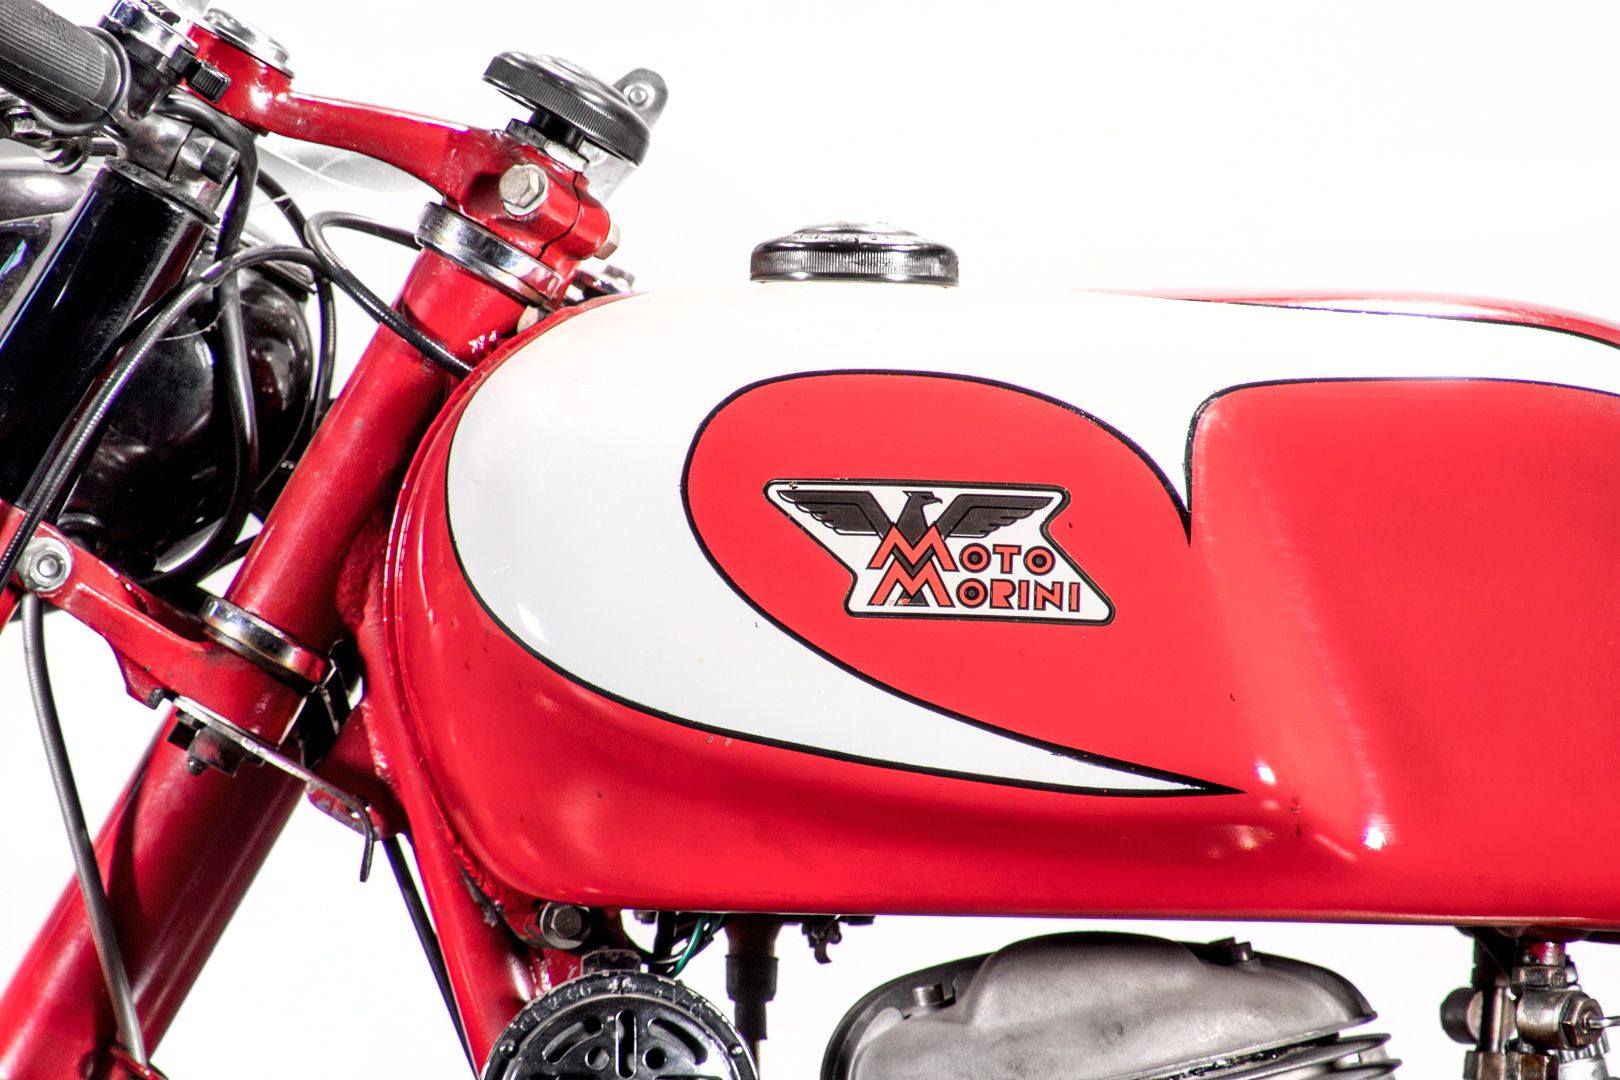 1957 Moto Morini 175 71734